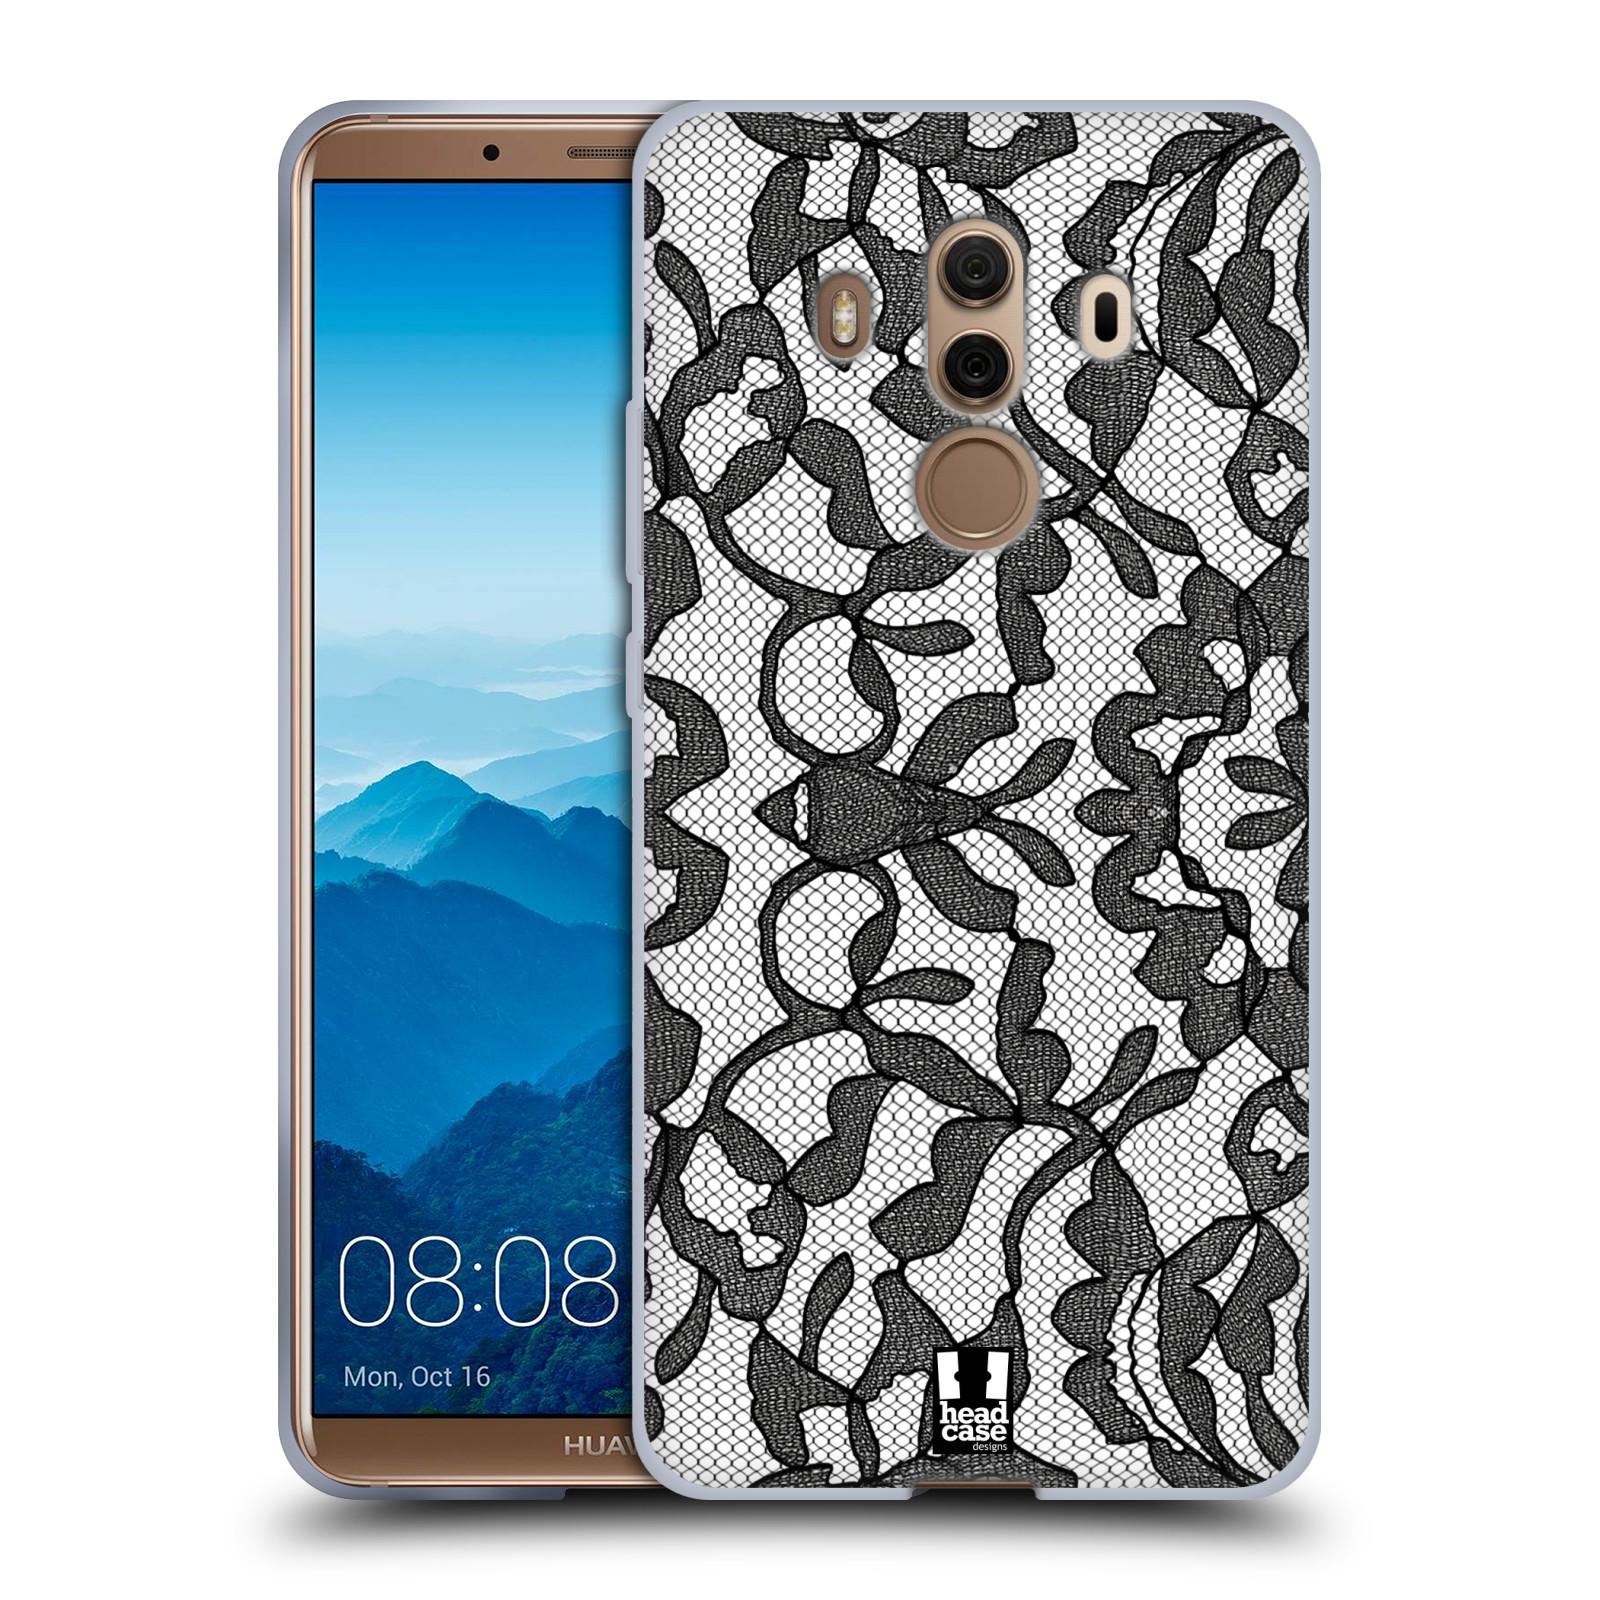 Silikonové pouzdro na mobil Huawei Mate 10 Pro - Head Case - LEAFY KRAJKA